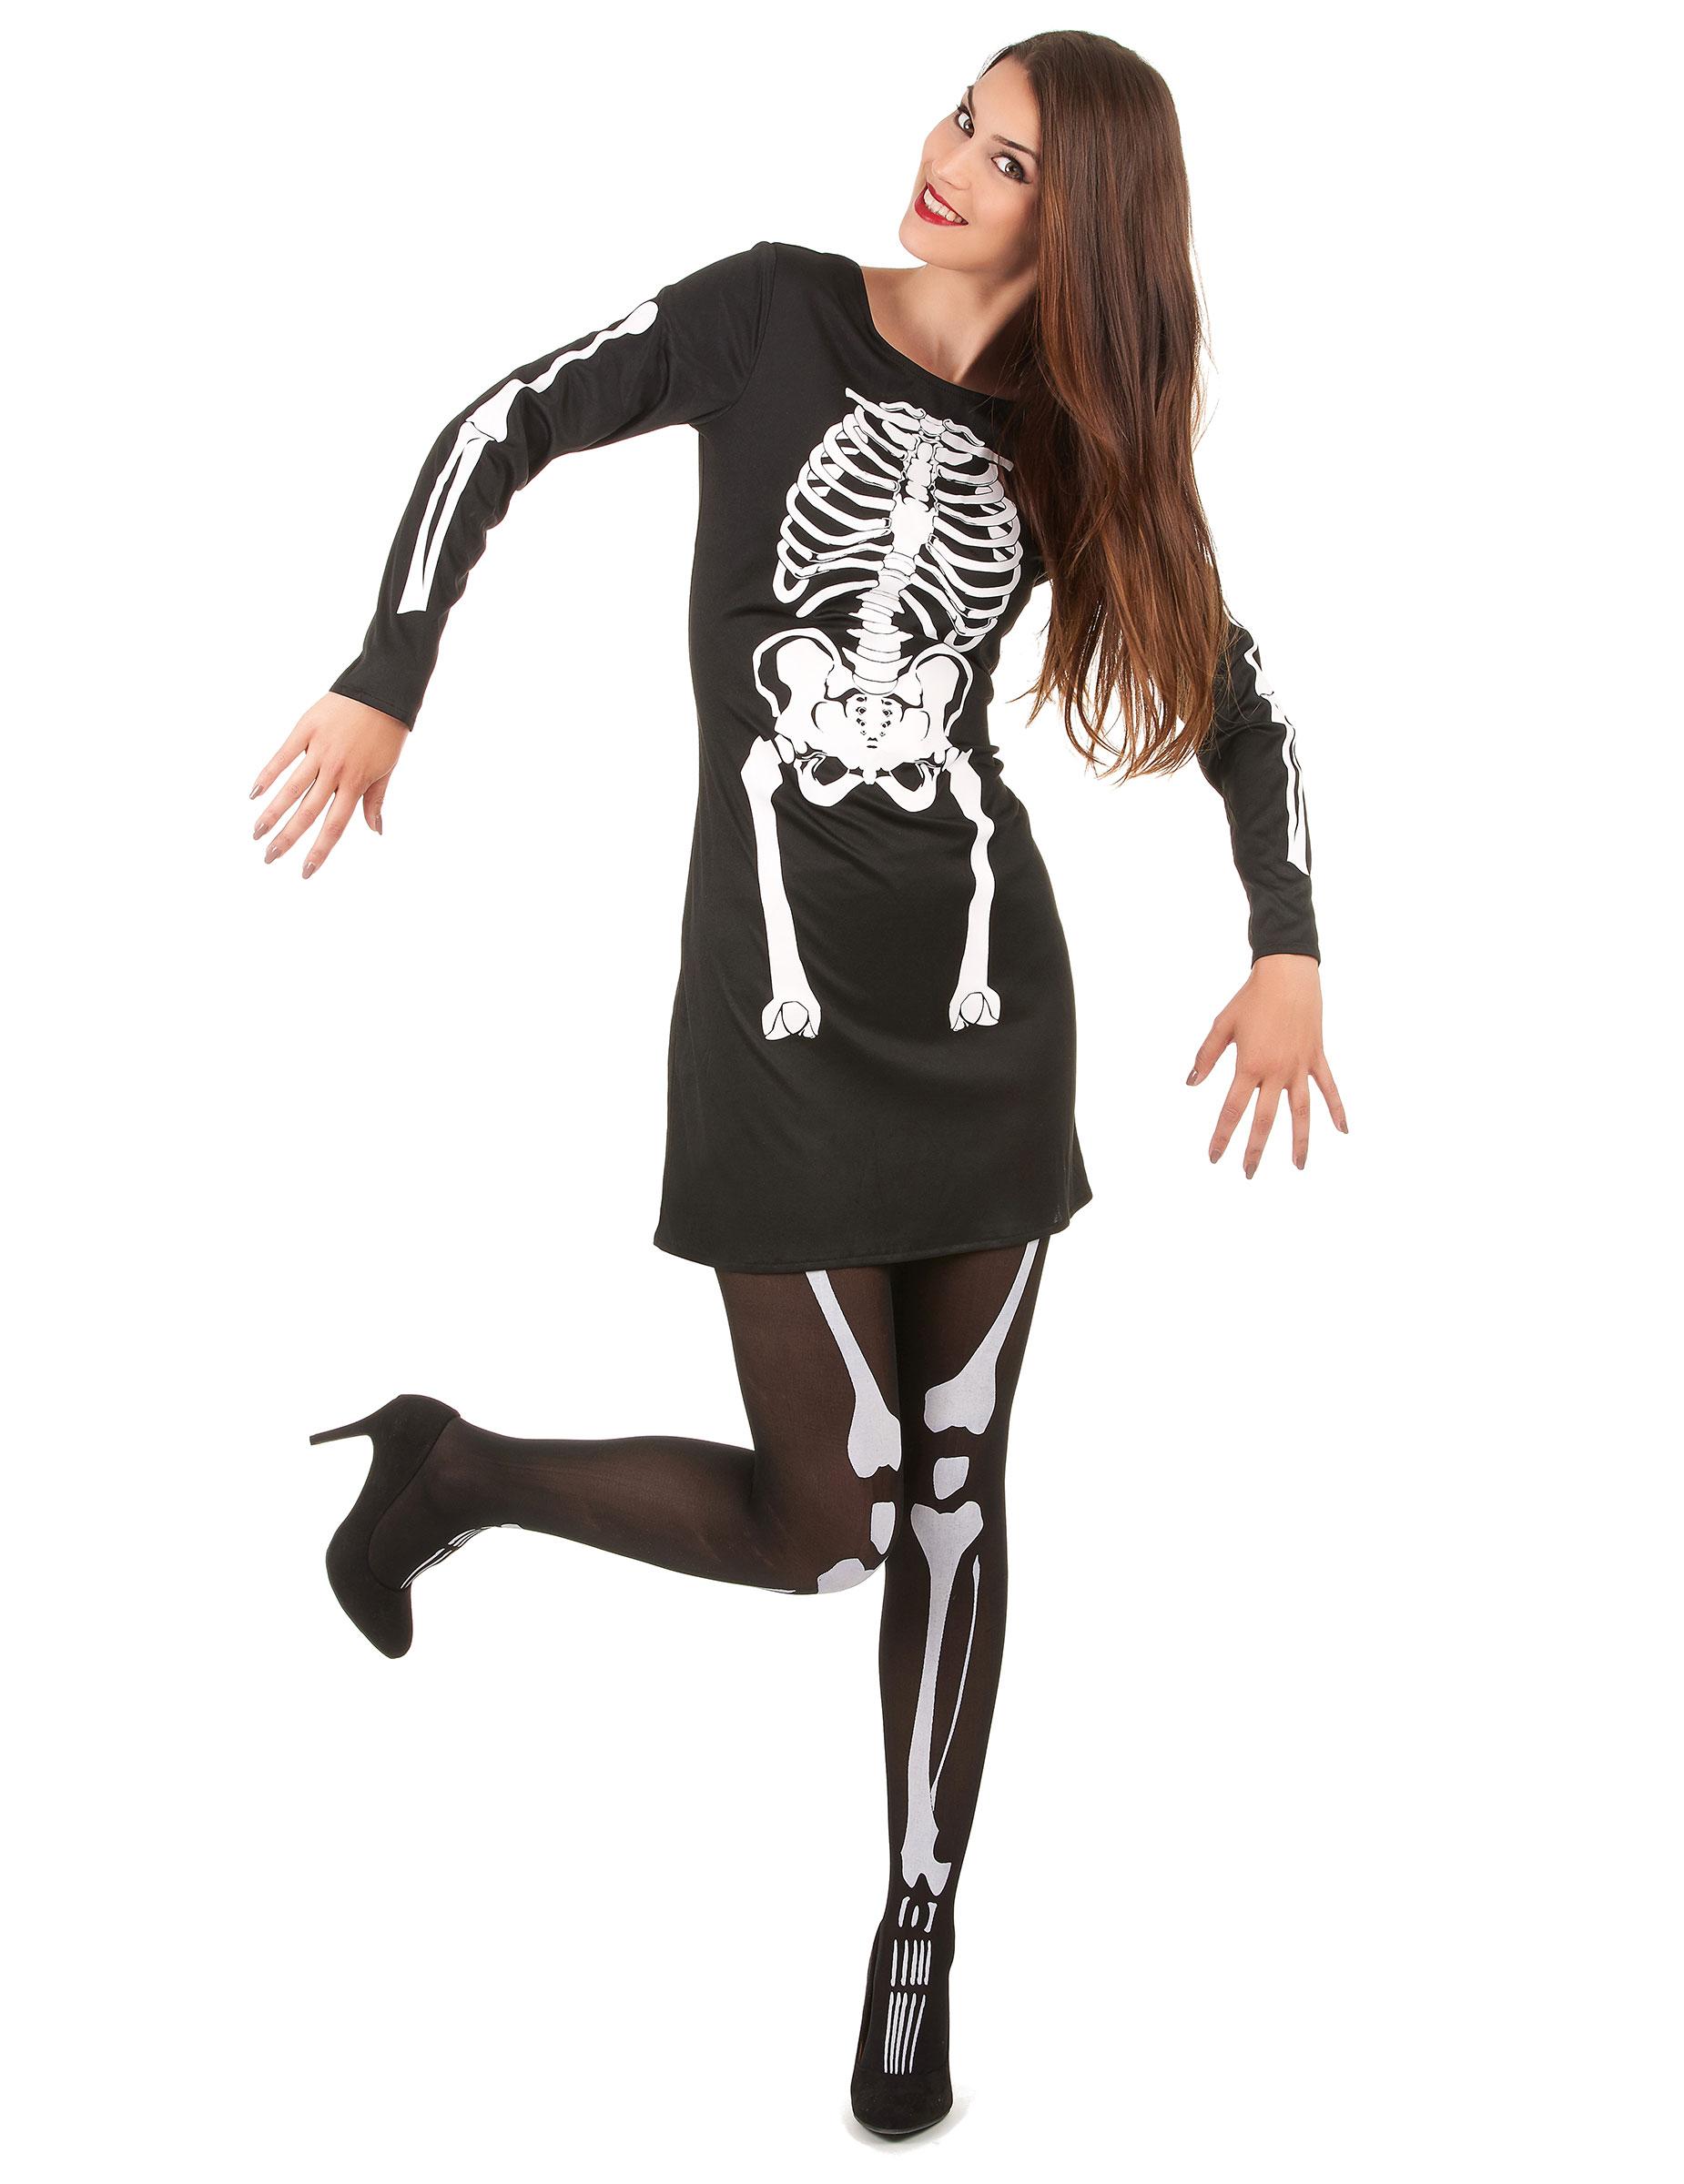 d guisement squelette femme halloween deguise toi achat. Black Bedroom Furniture Sets. Home Design Ideas